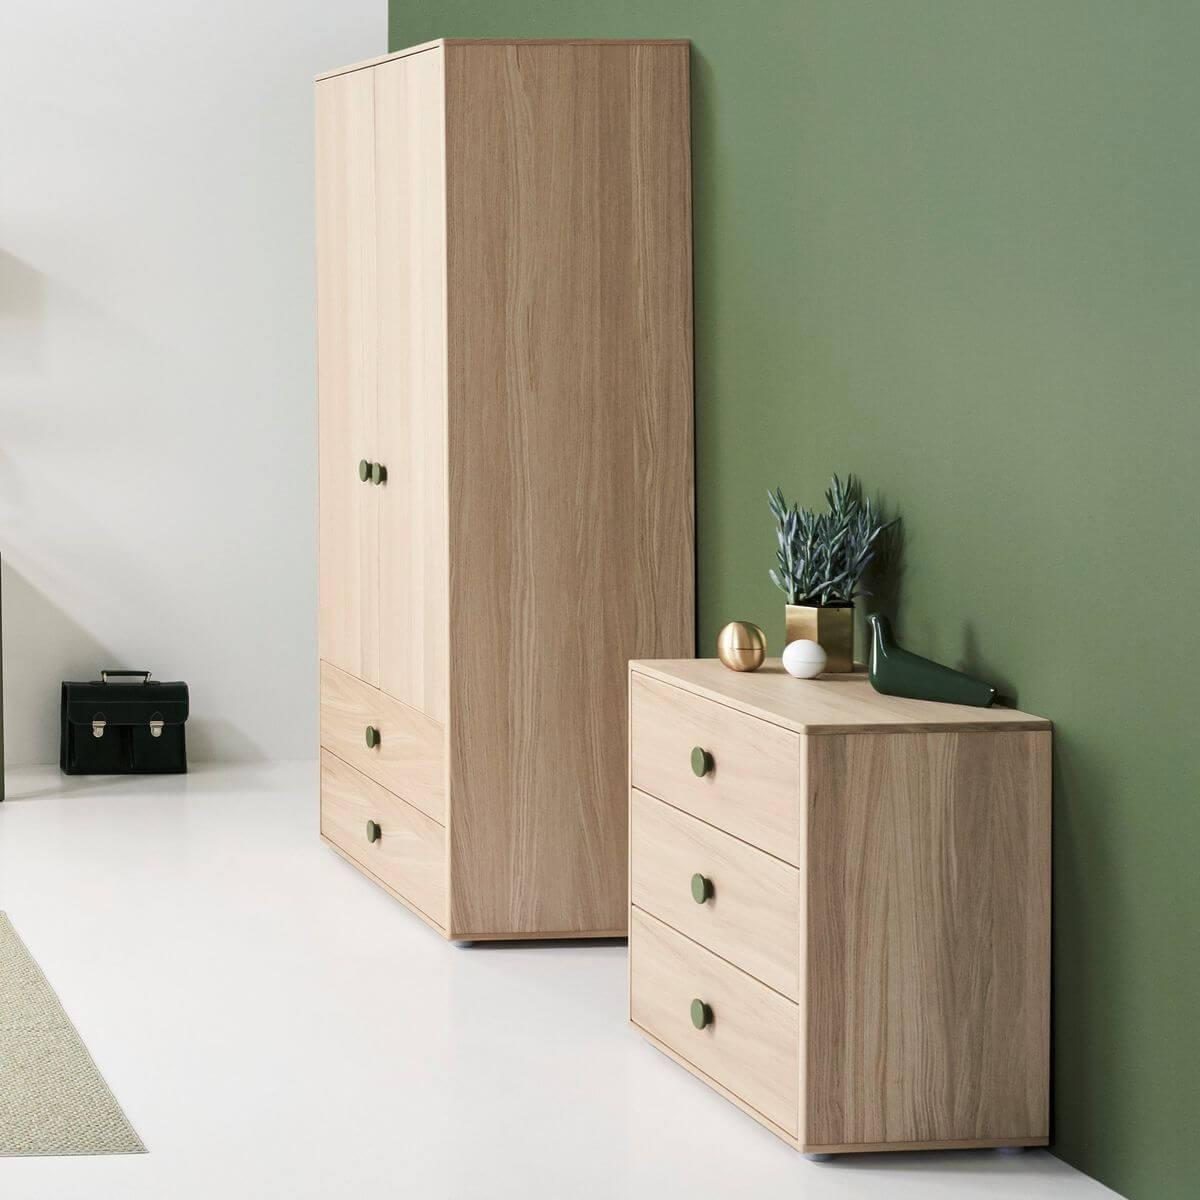 Commode 3 tiroirs POPSICLE Flexa chêne-kiwi